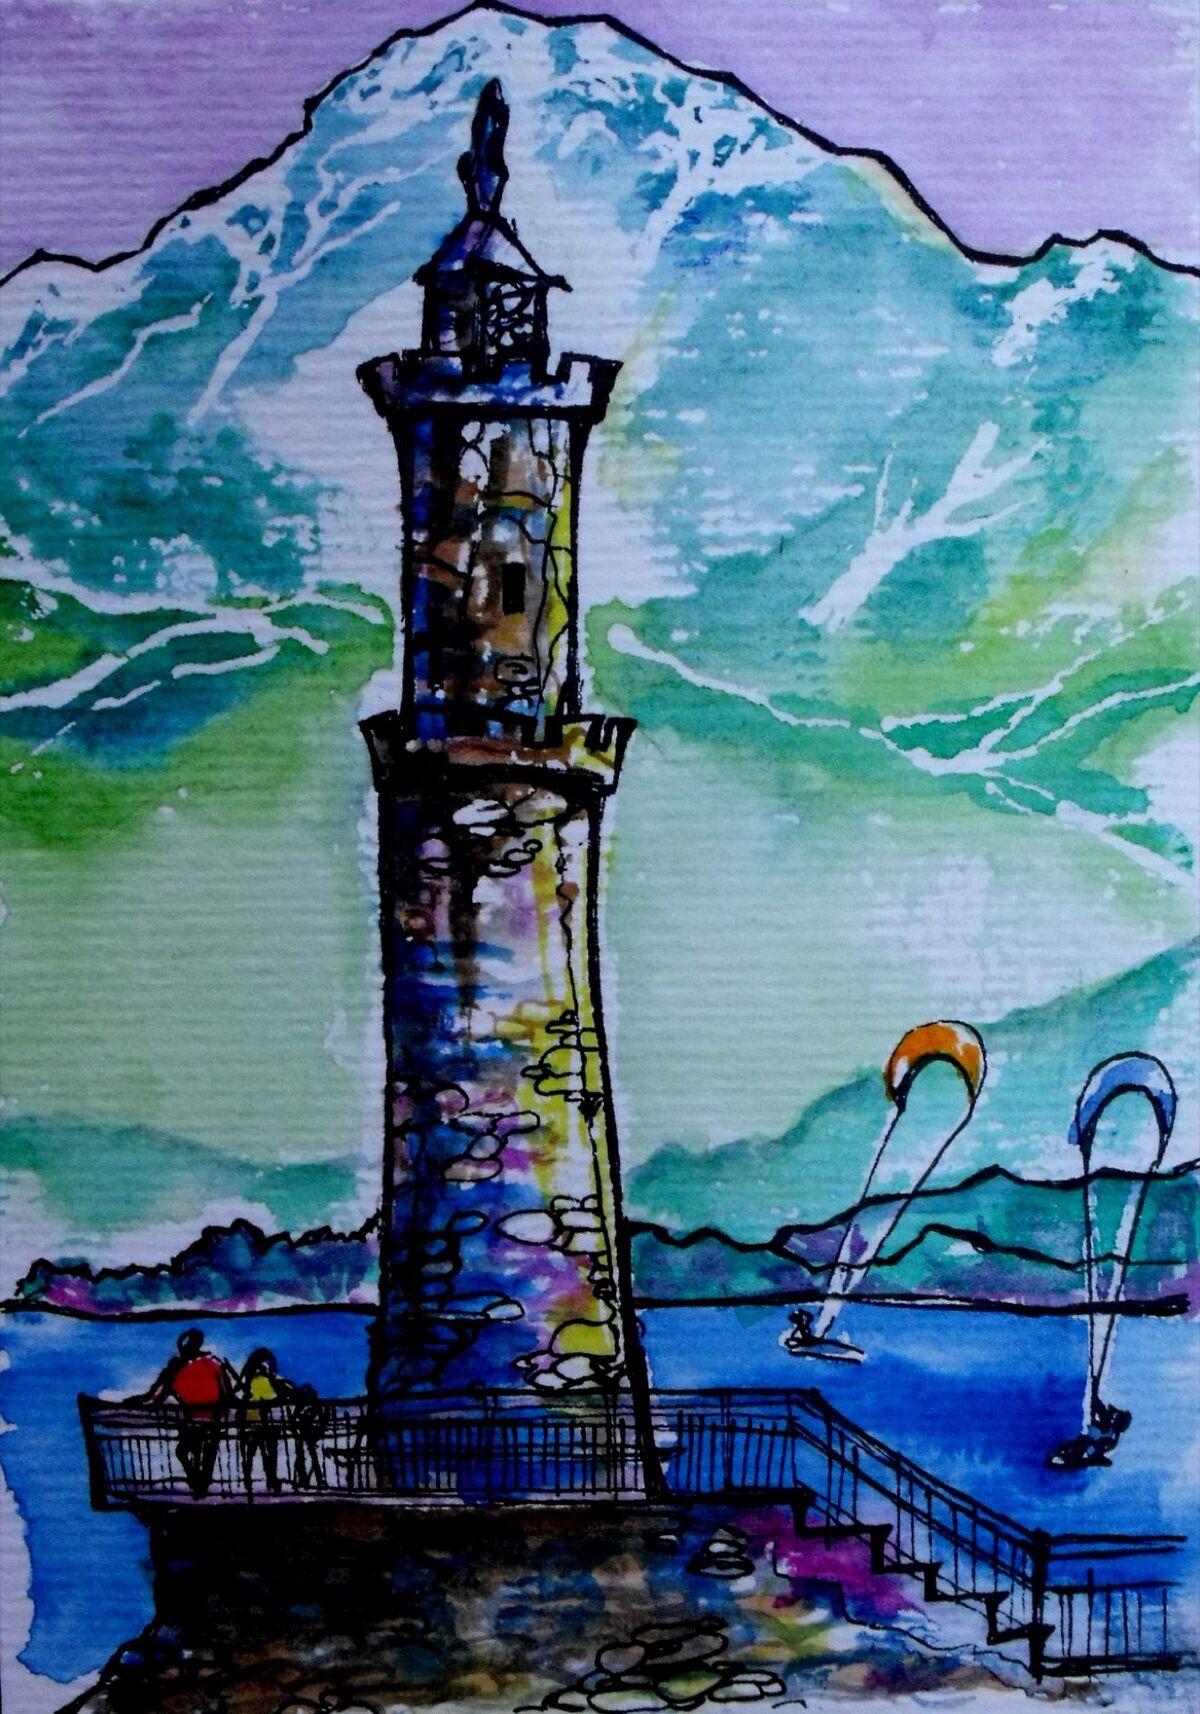 Alto Lario Lighthouse and Mt. Legnone where Leonardo hiked. Sketch by Nikki Martinez. Courtesy of the artist.